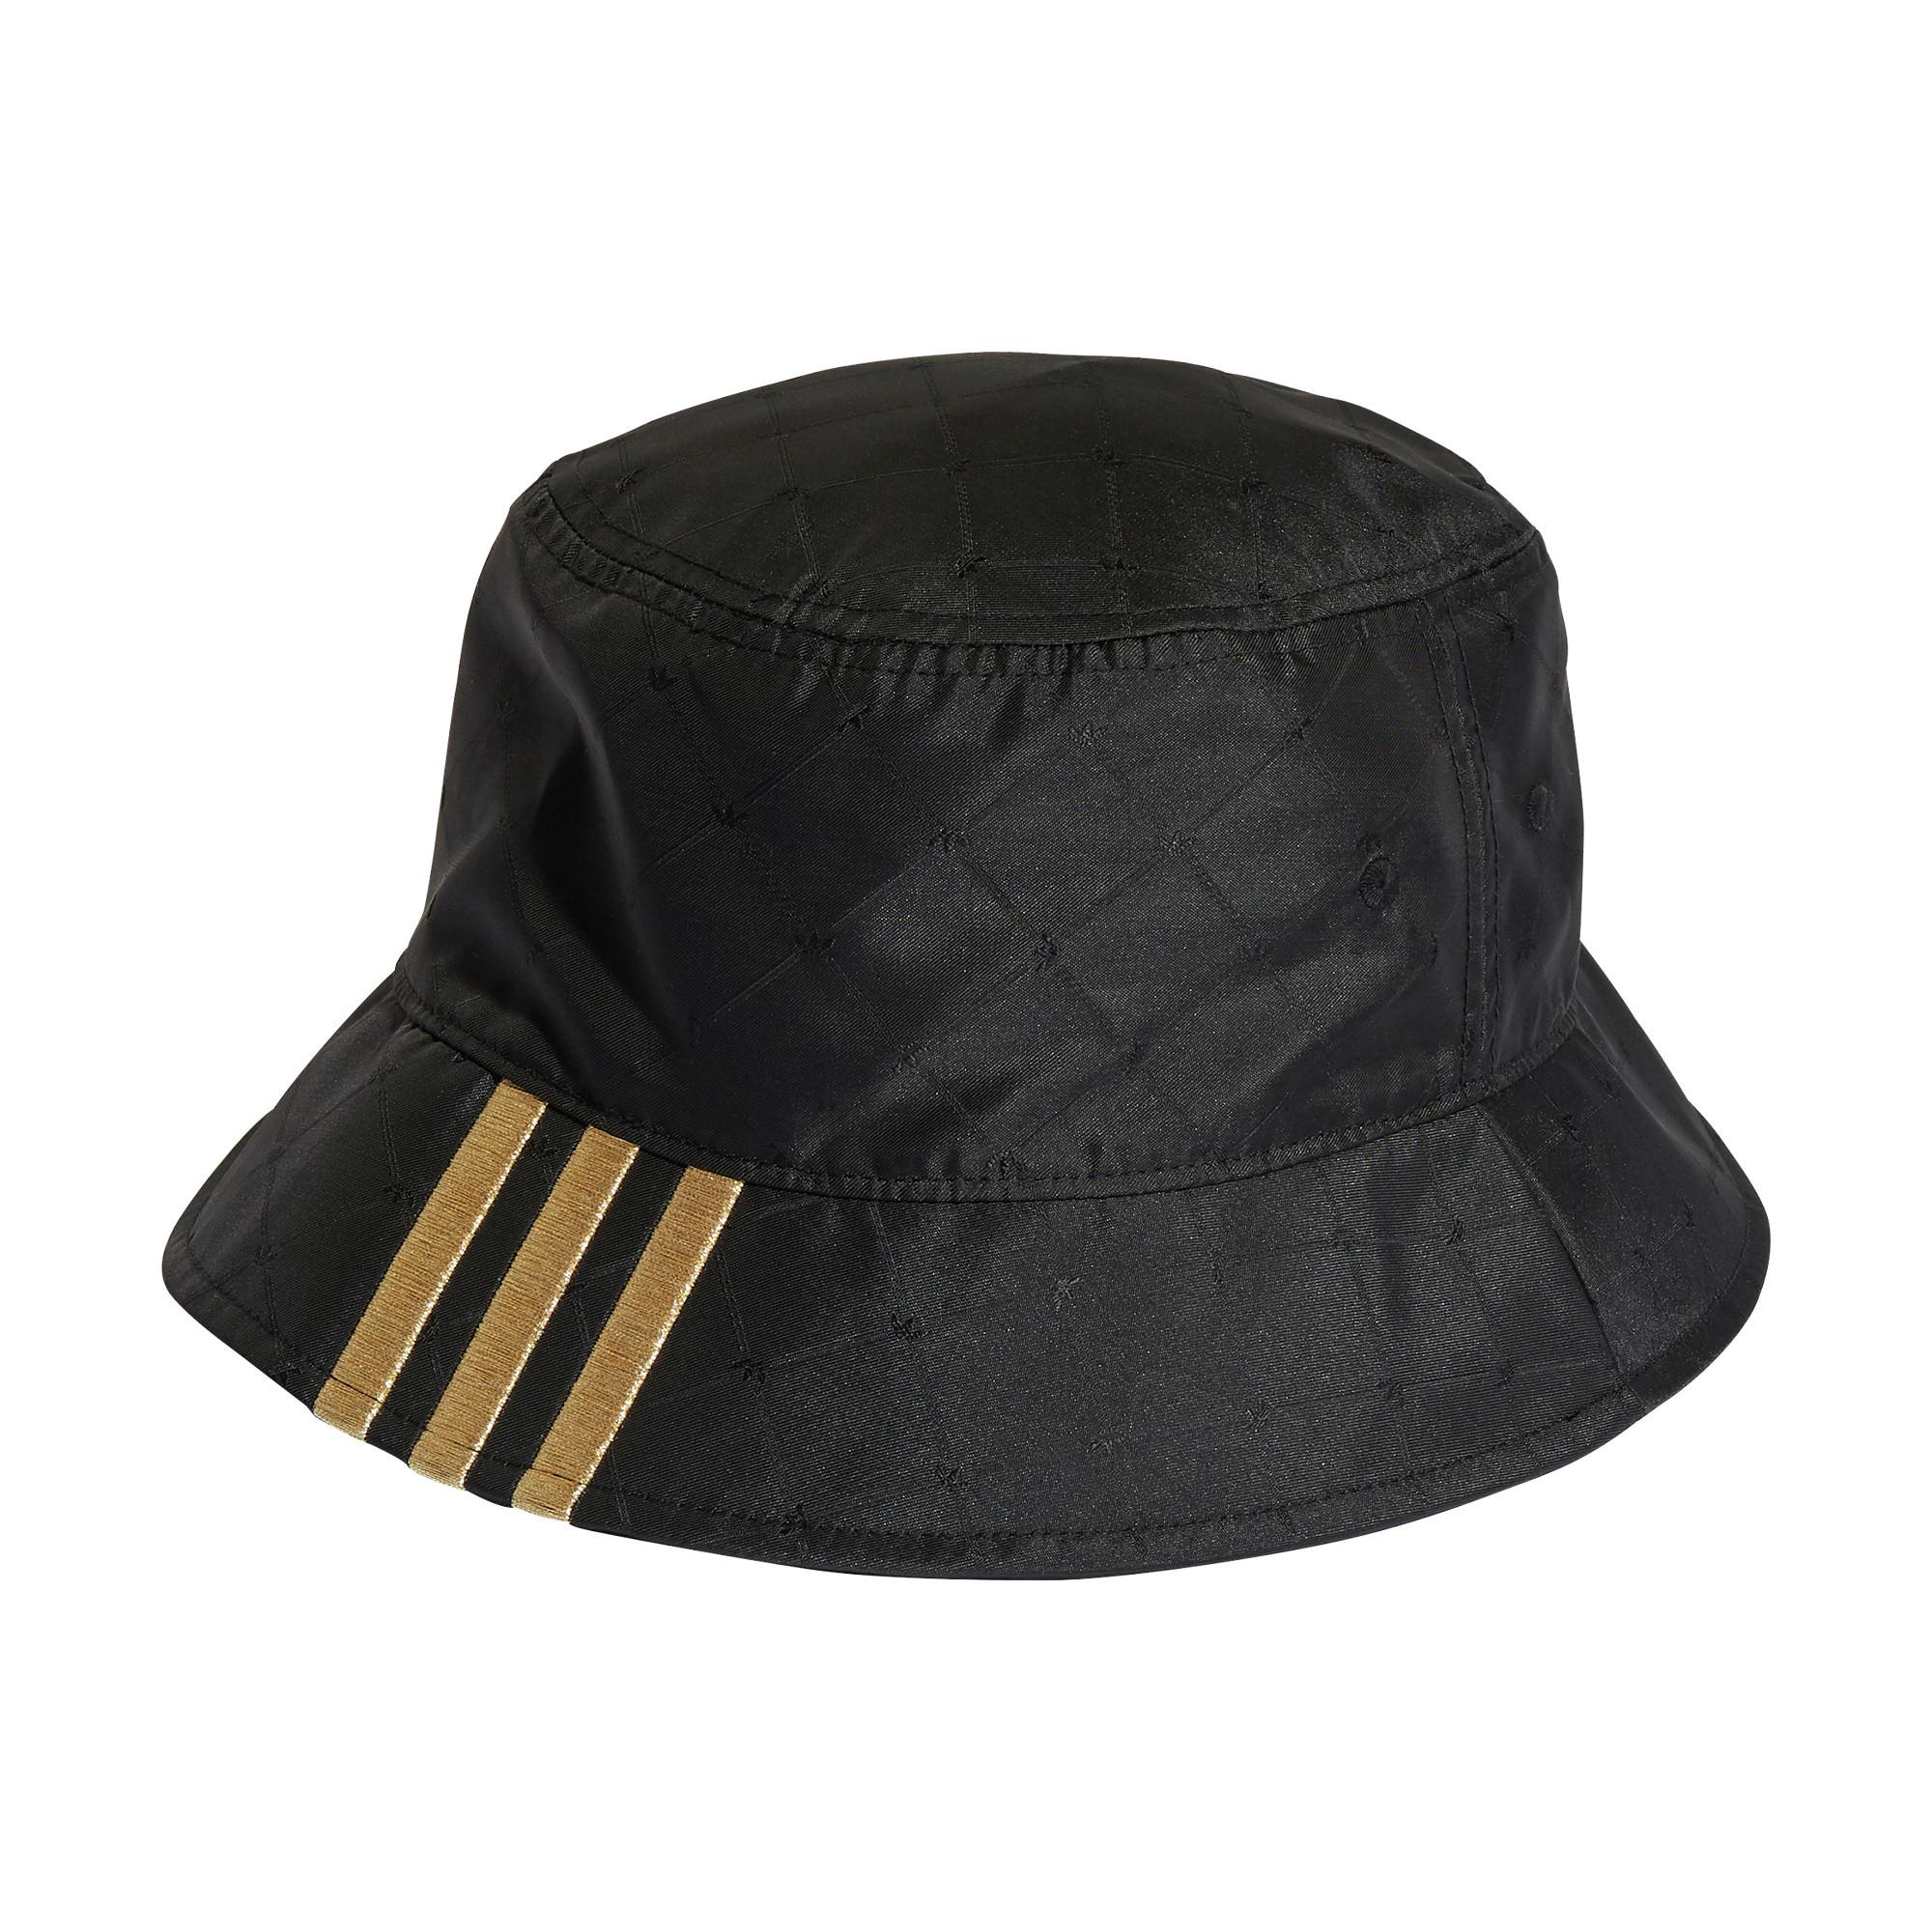 Cappello Adicolor Bucket, Nero, large image number 1